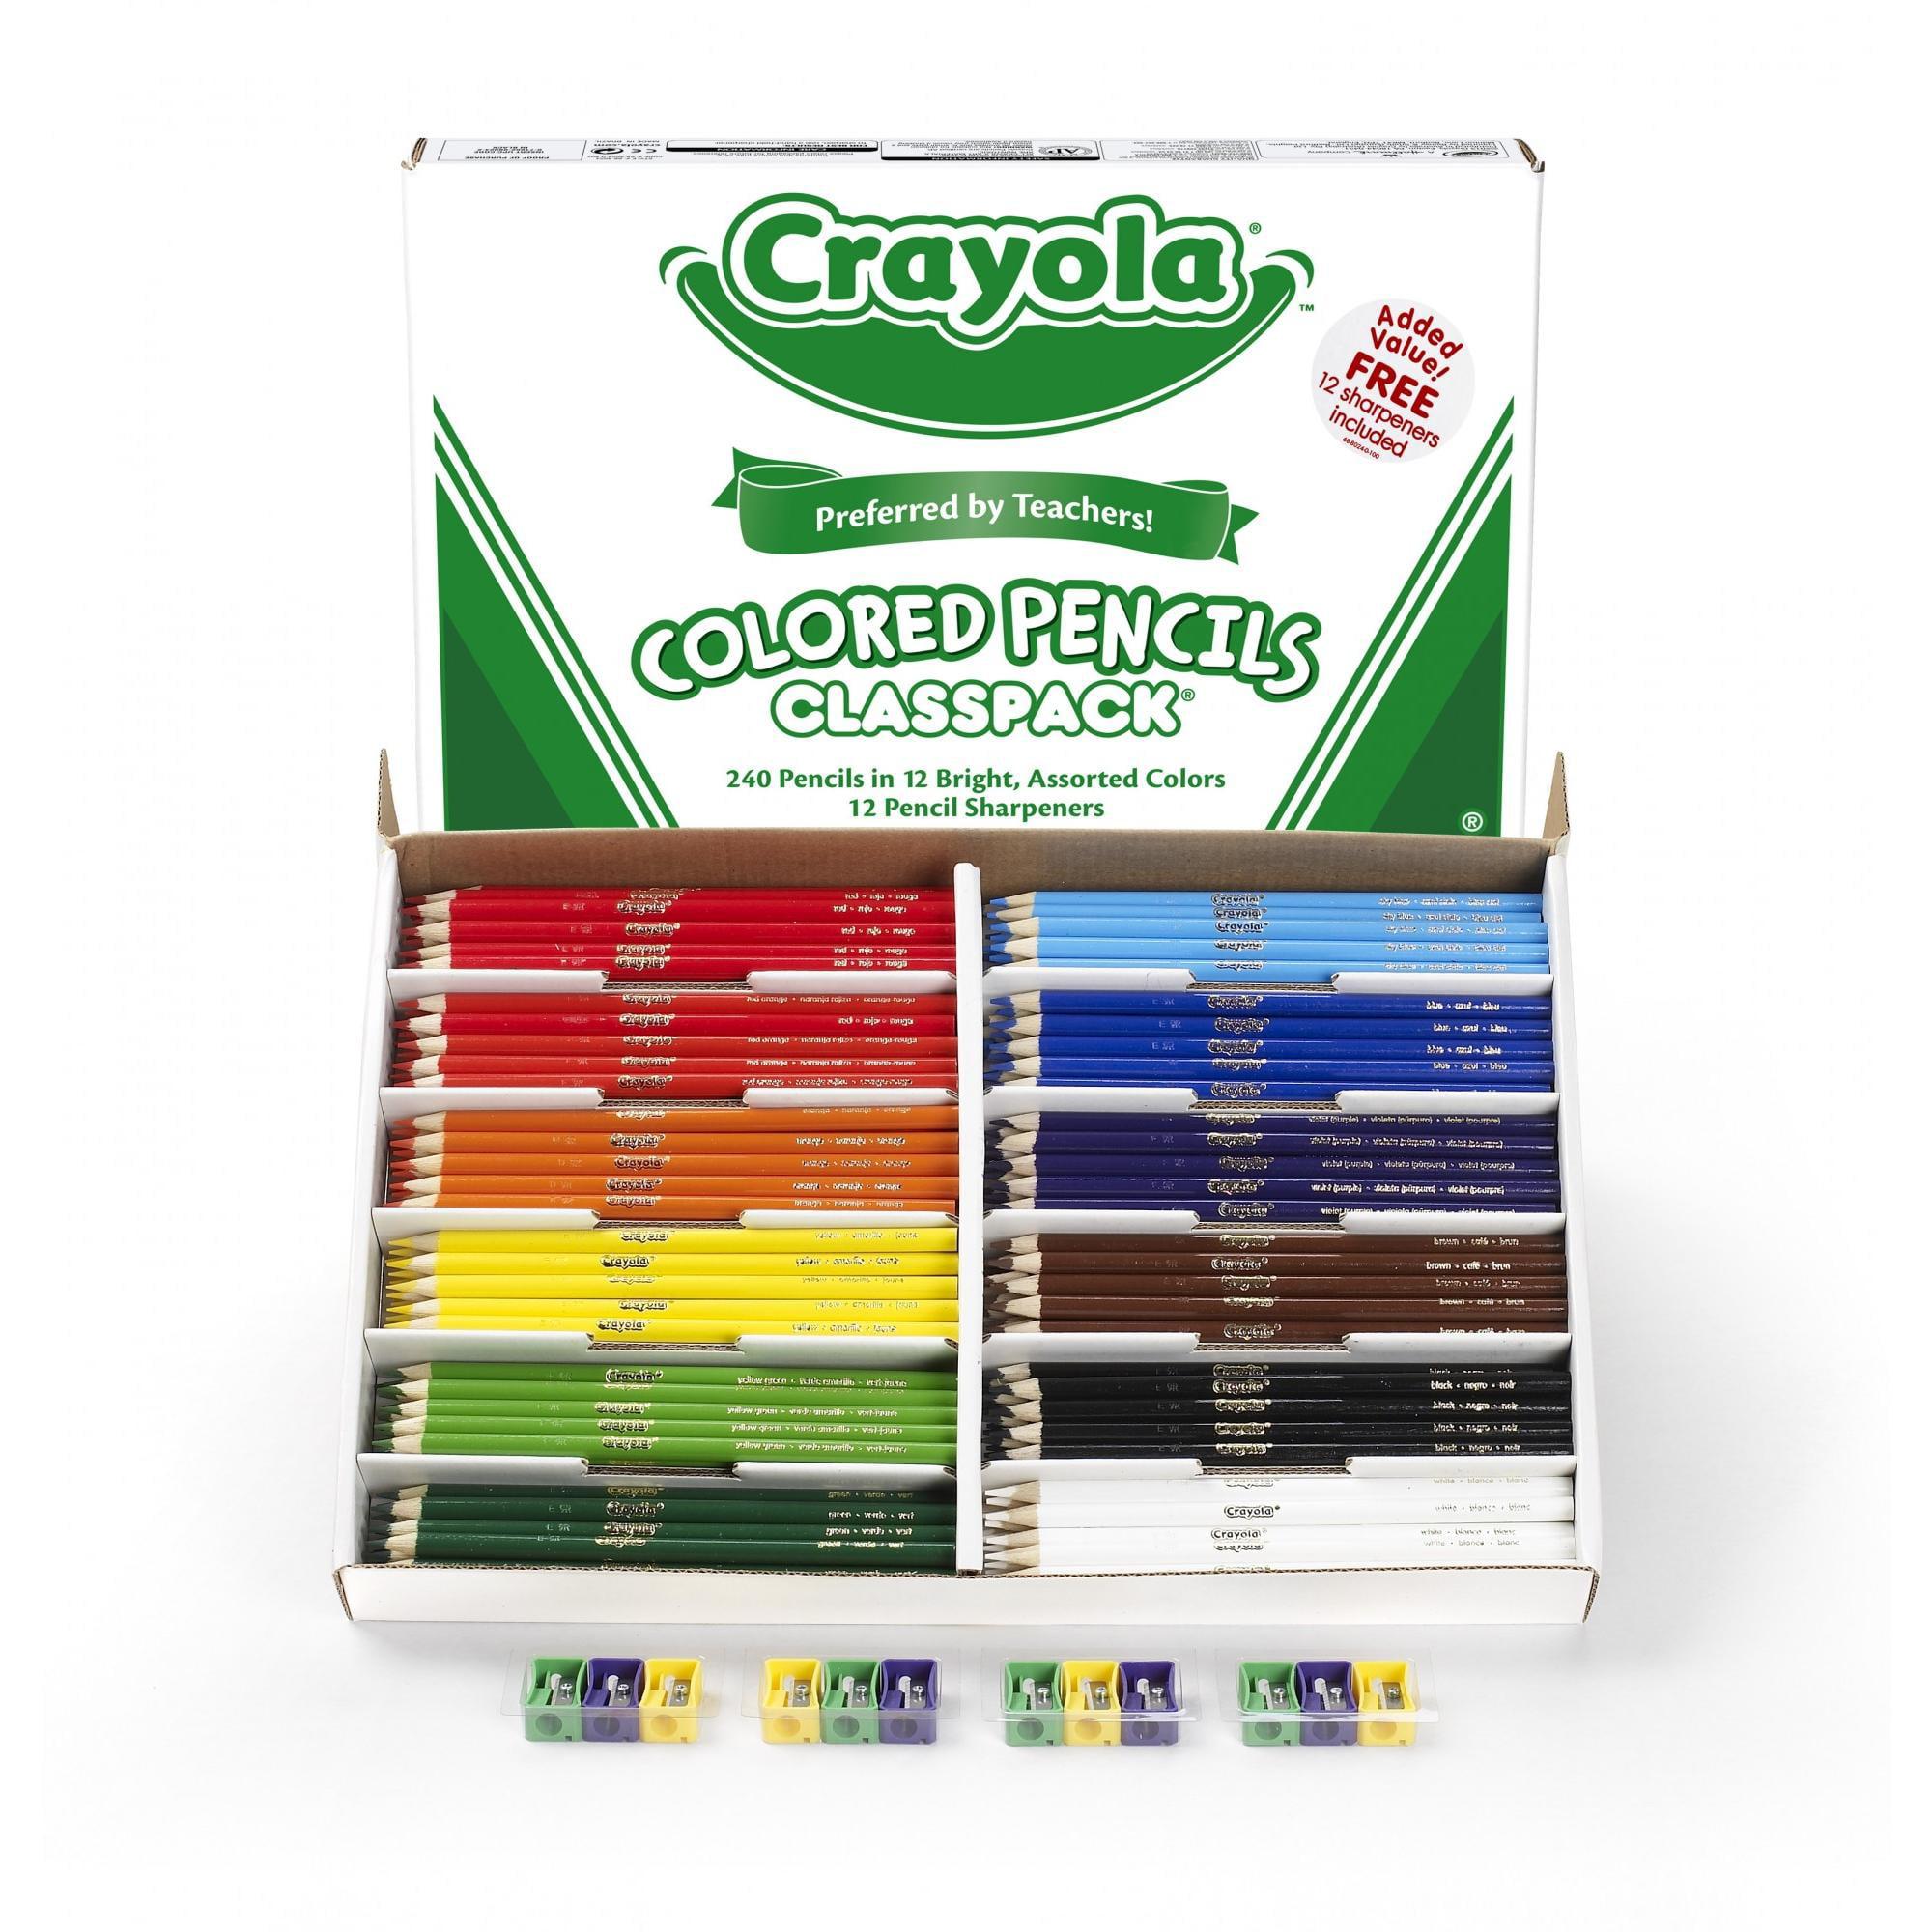 Crayola® Colored Pencil Classpack, 12 Colors, 240 Count - Walmart.com